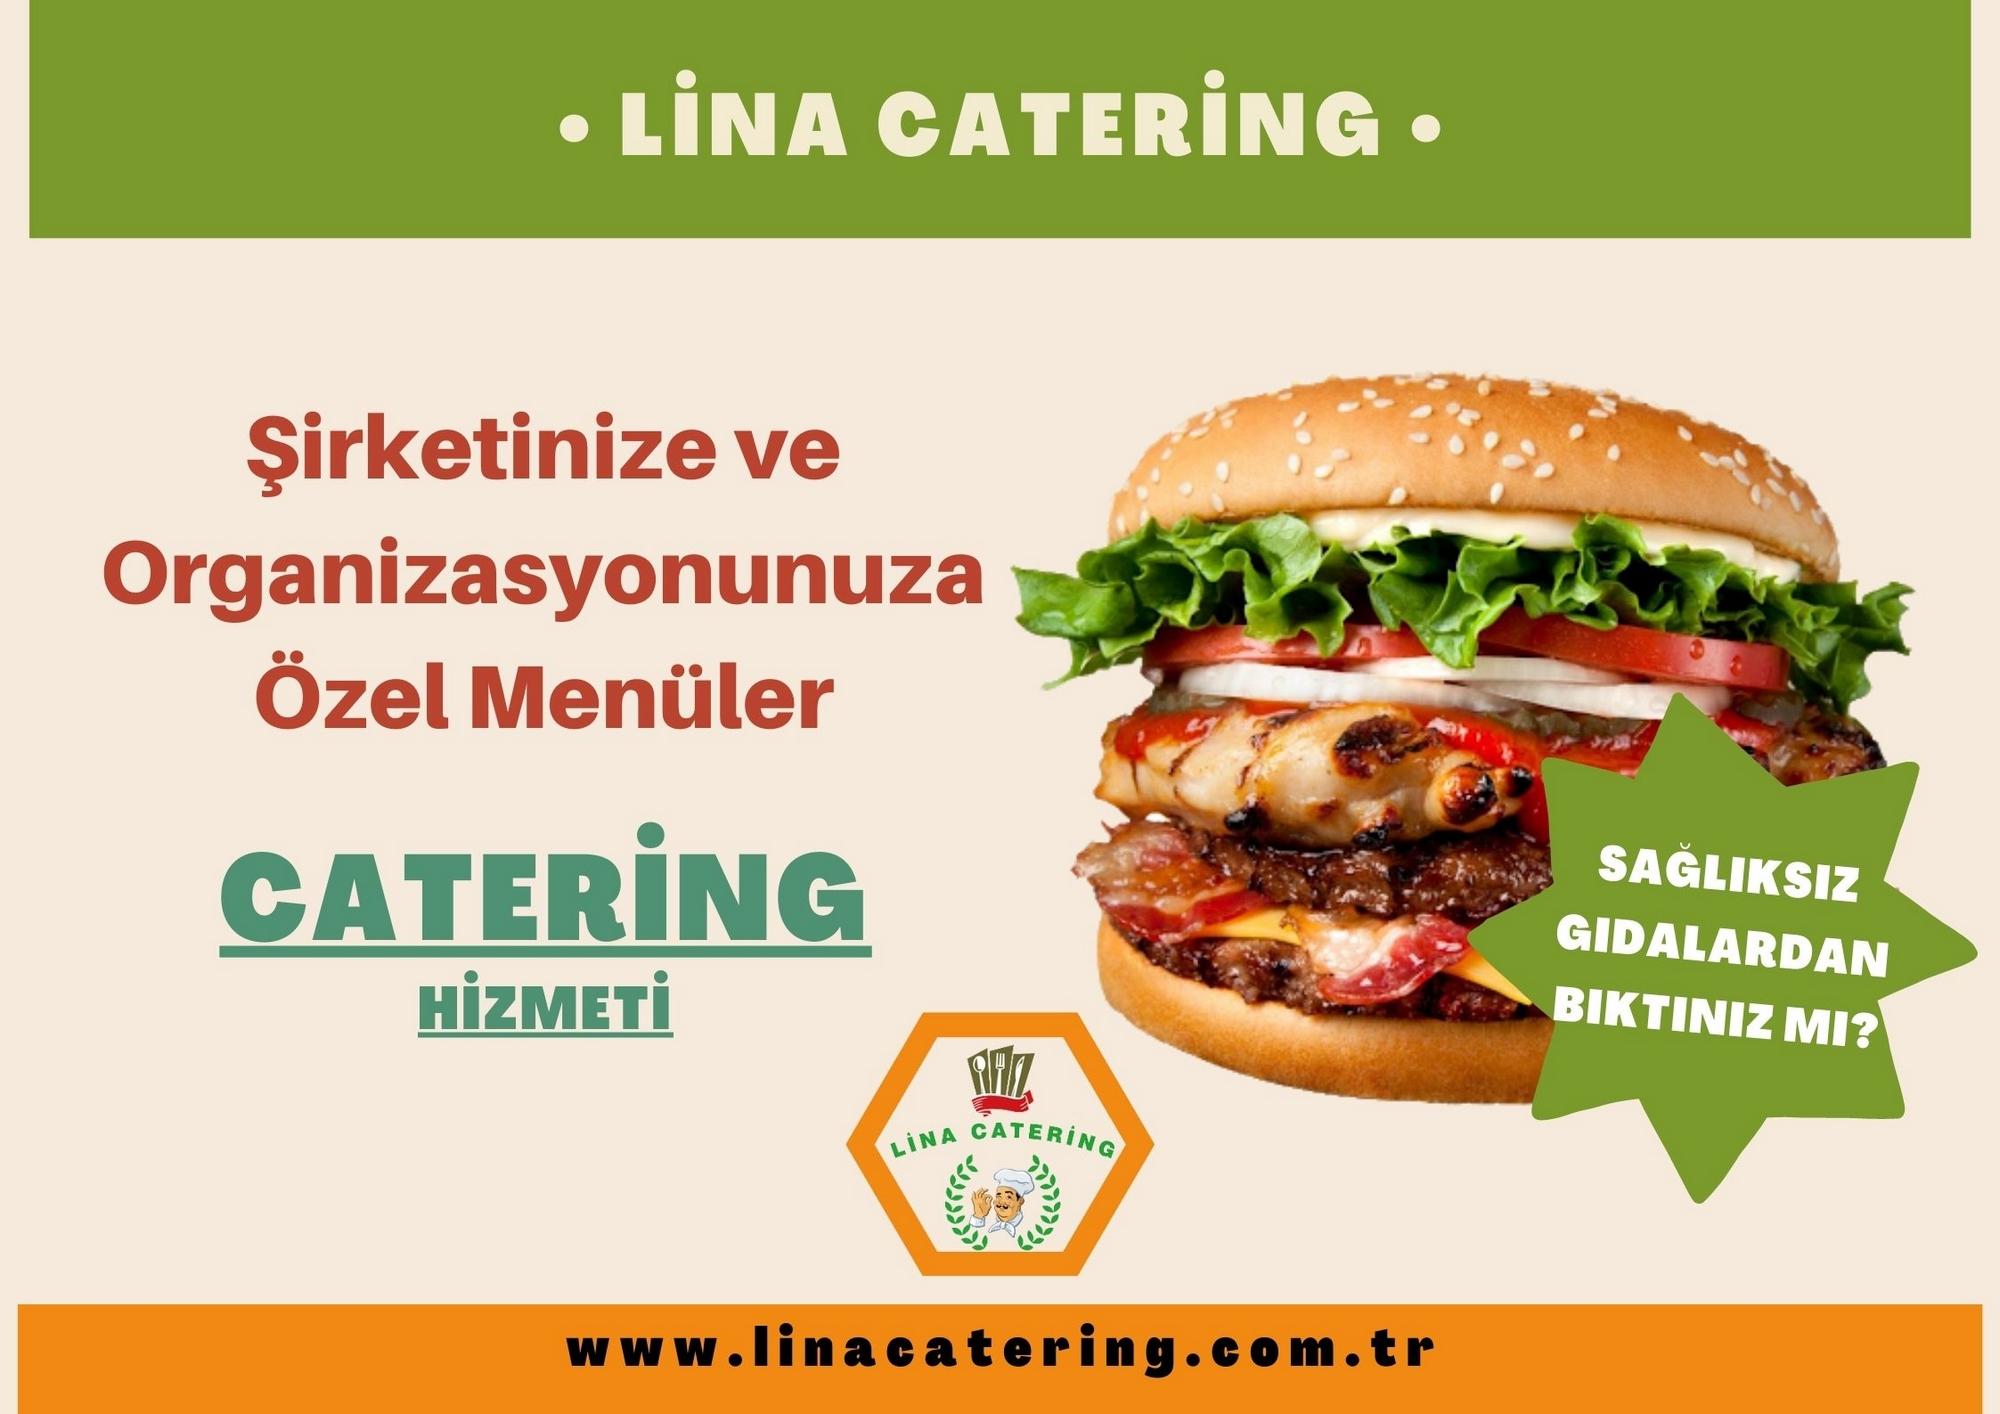 BAYRAMPAŞA Catering